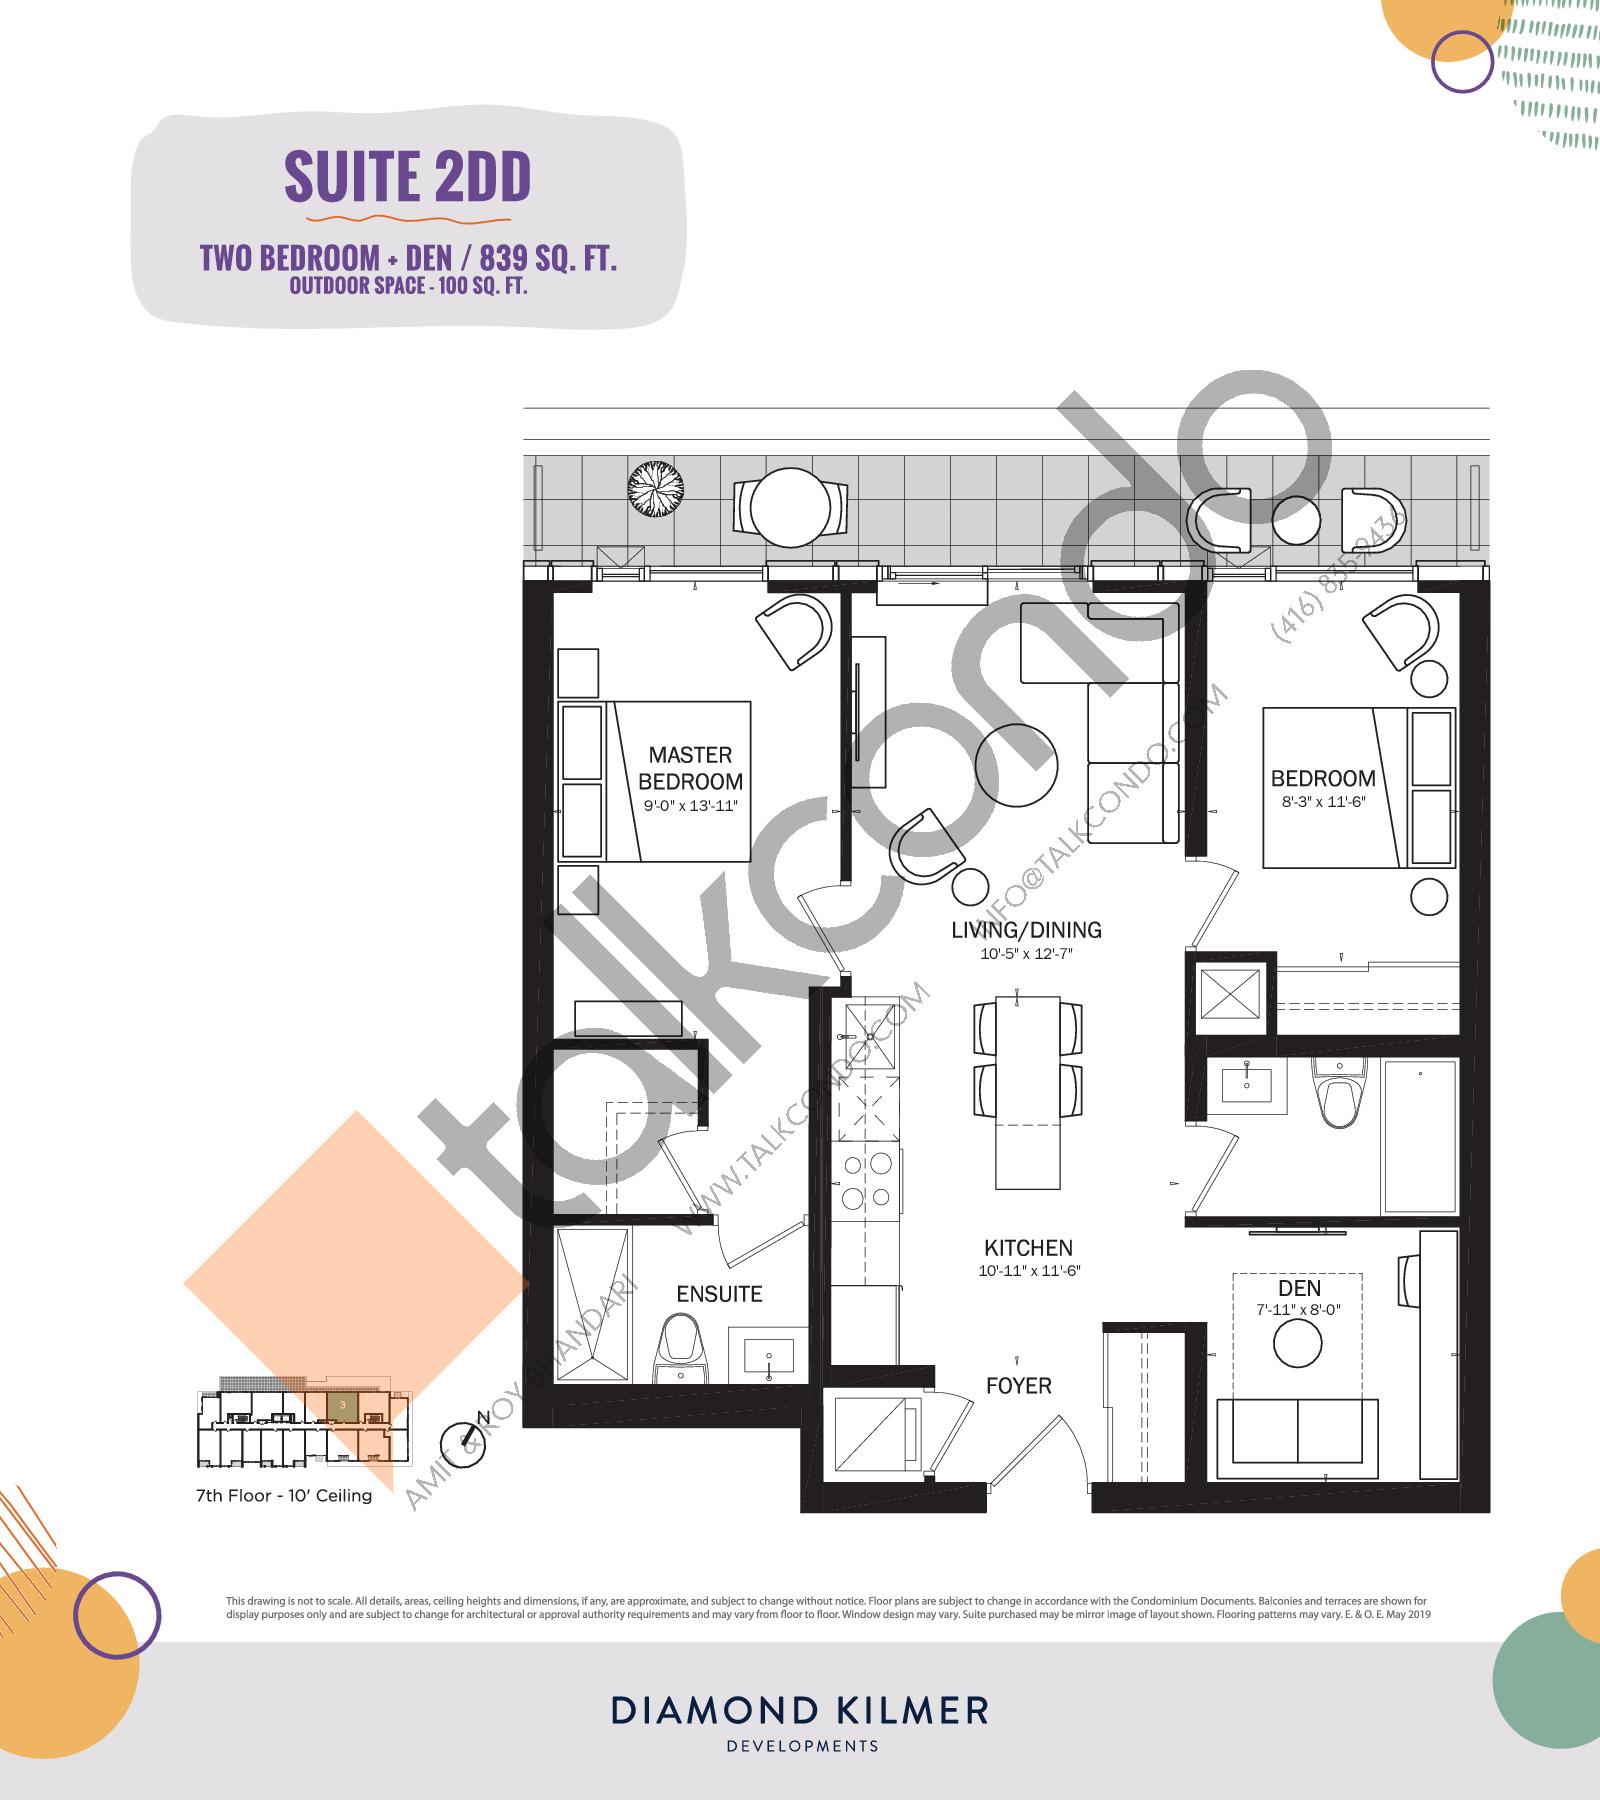 2DD Floor Plan at Reunion Crossing Condos & Urban Towns - 839 sq.ft